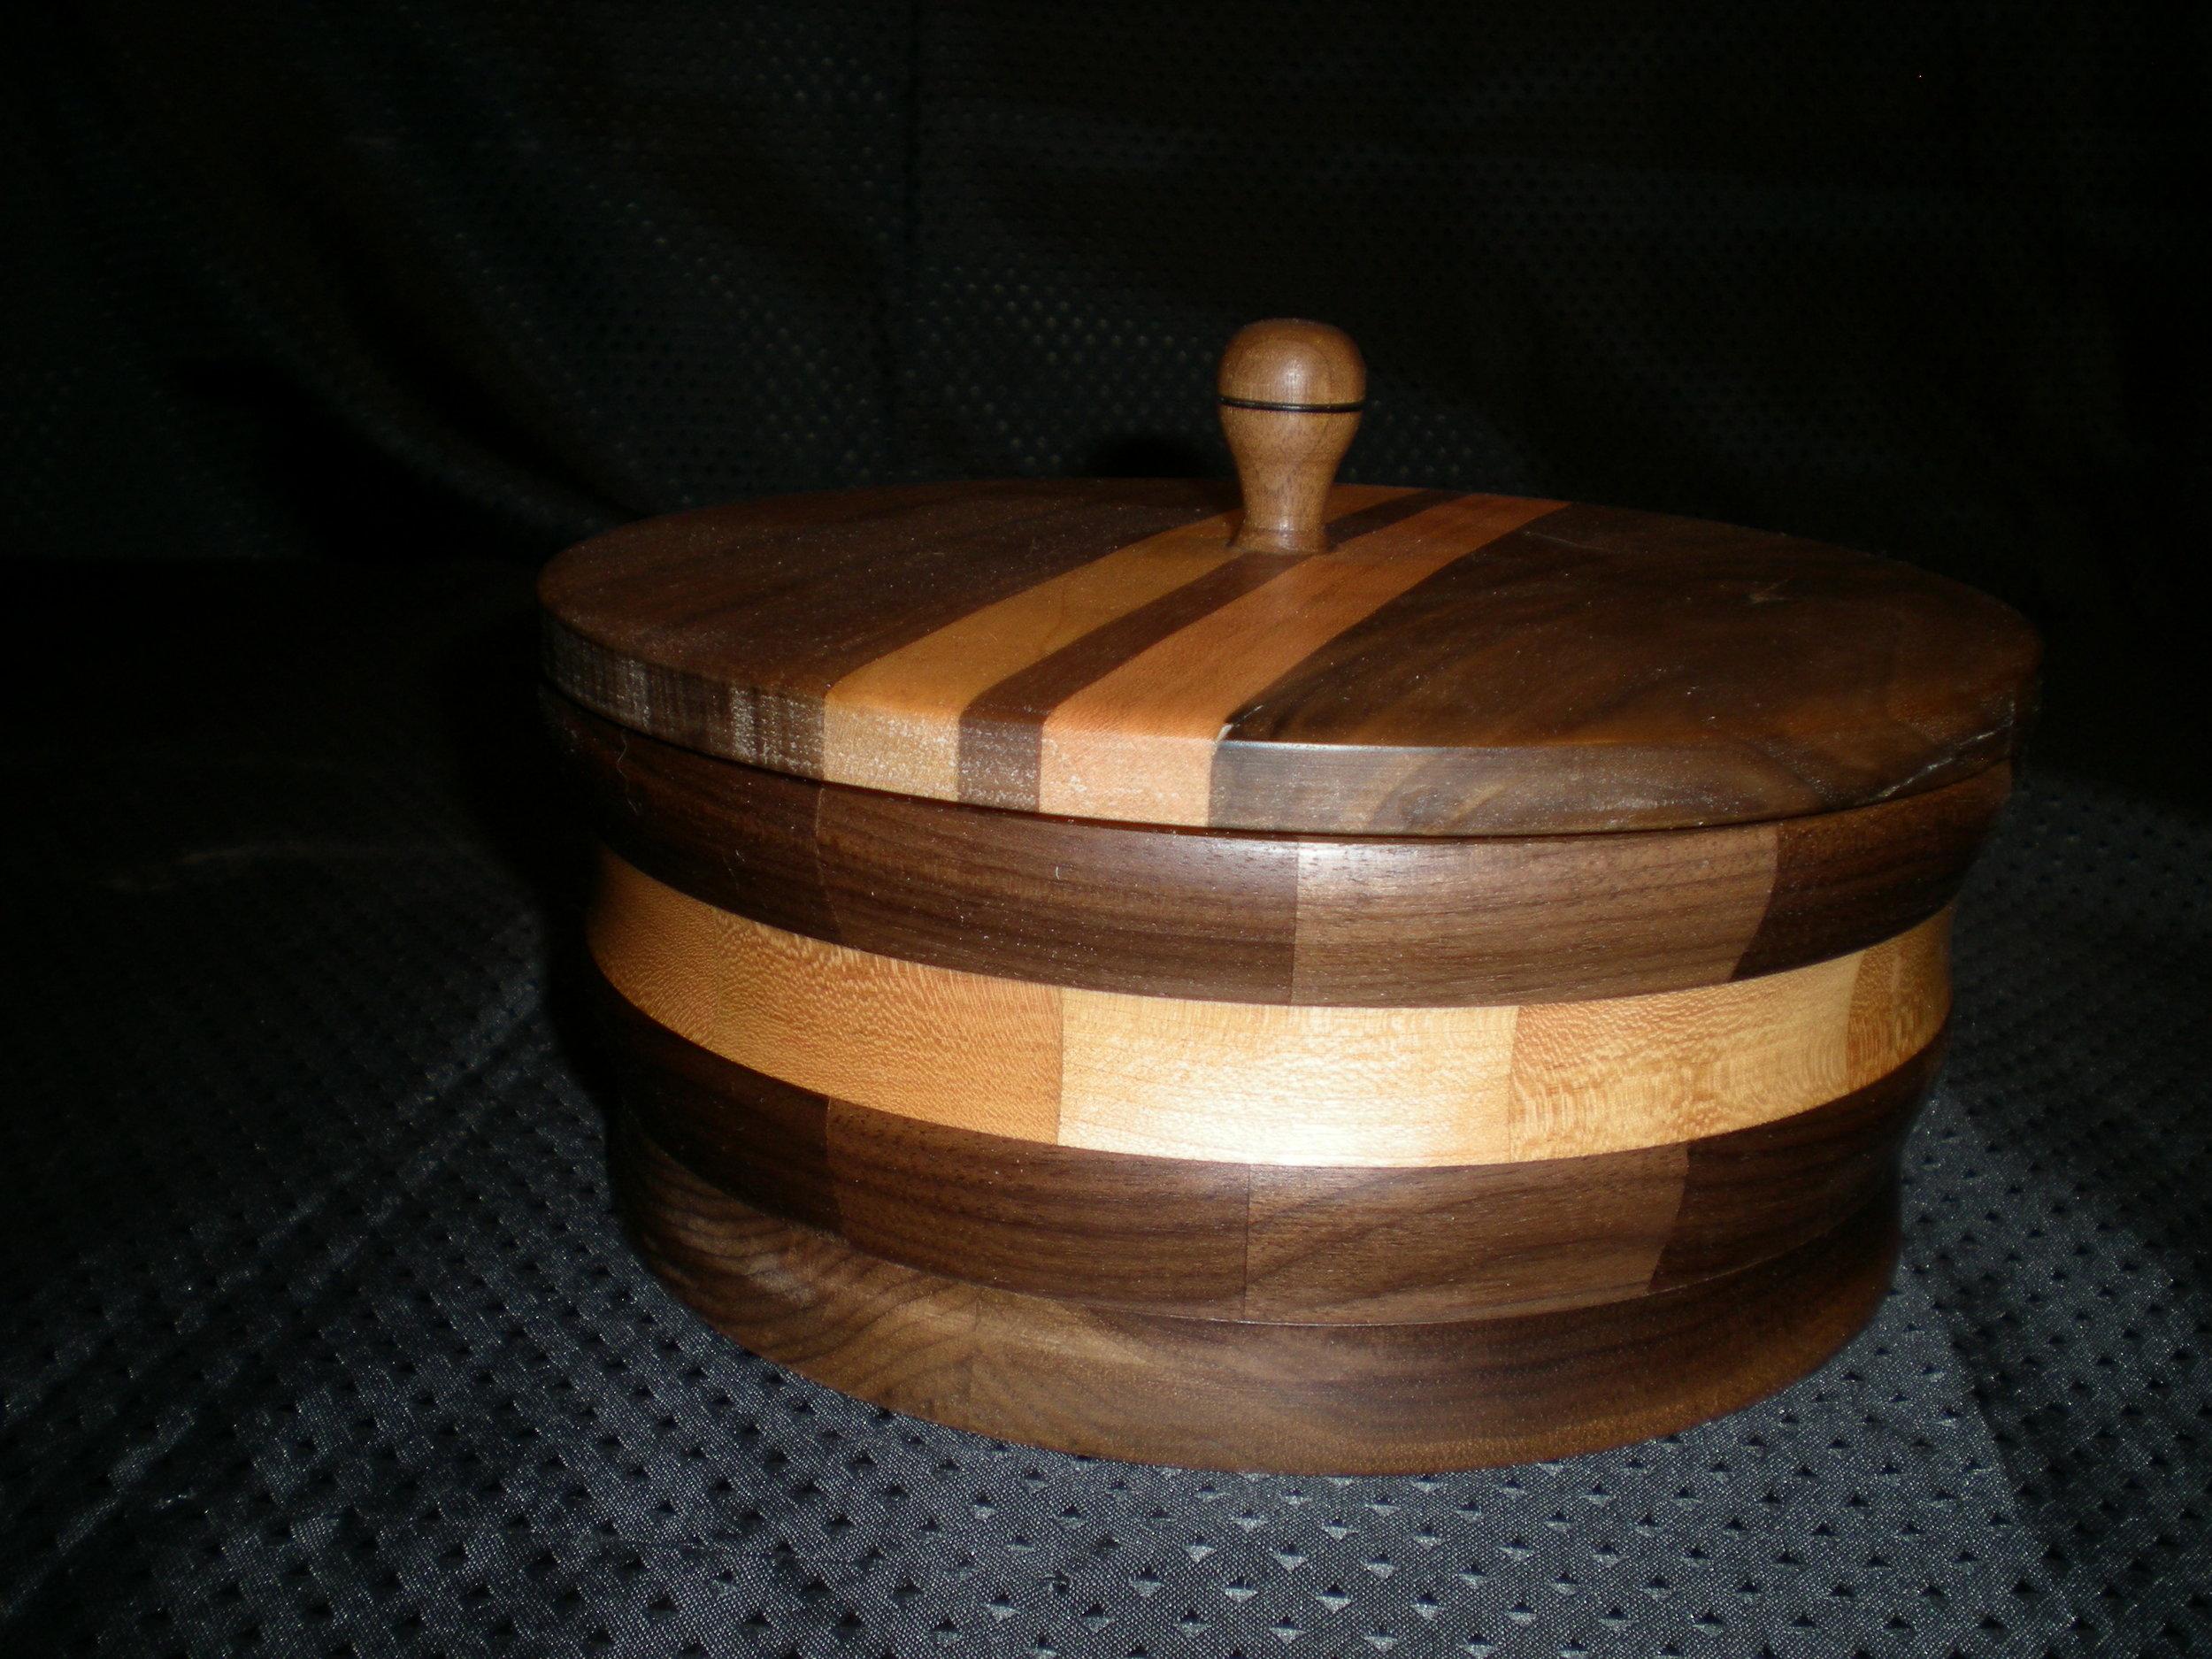 RJC Wood Creations - Bowls (6).JPG